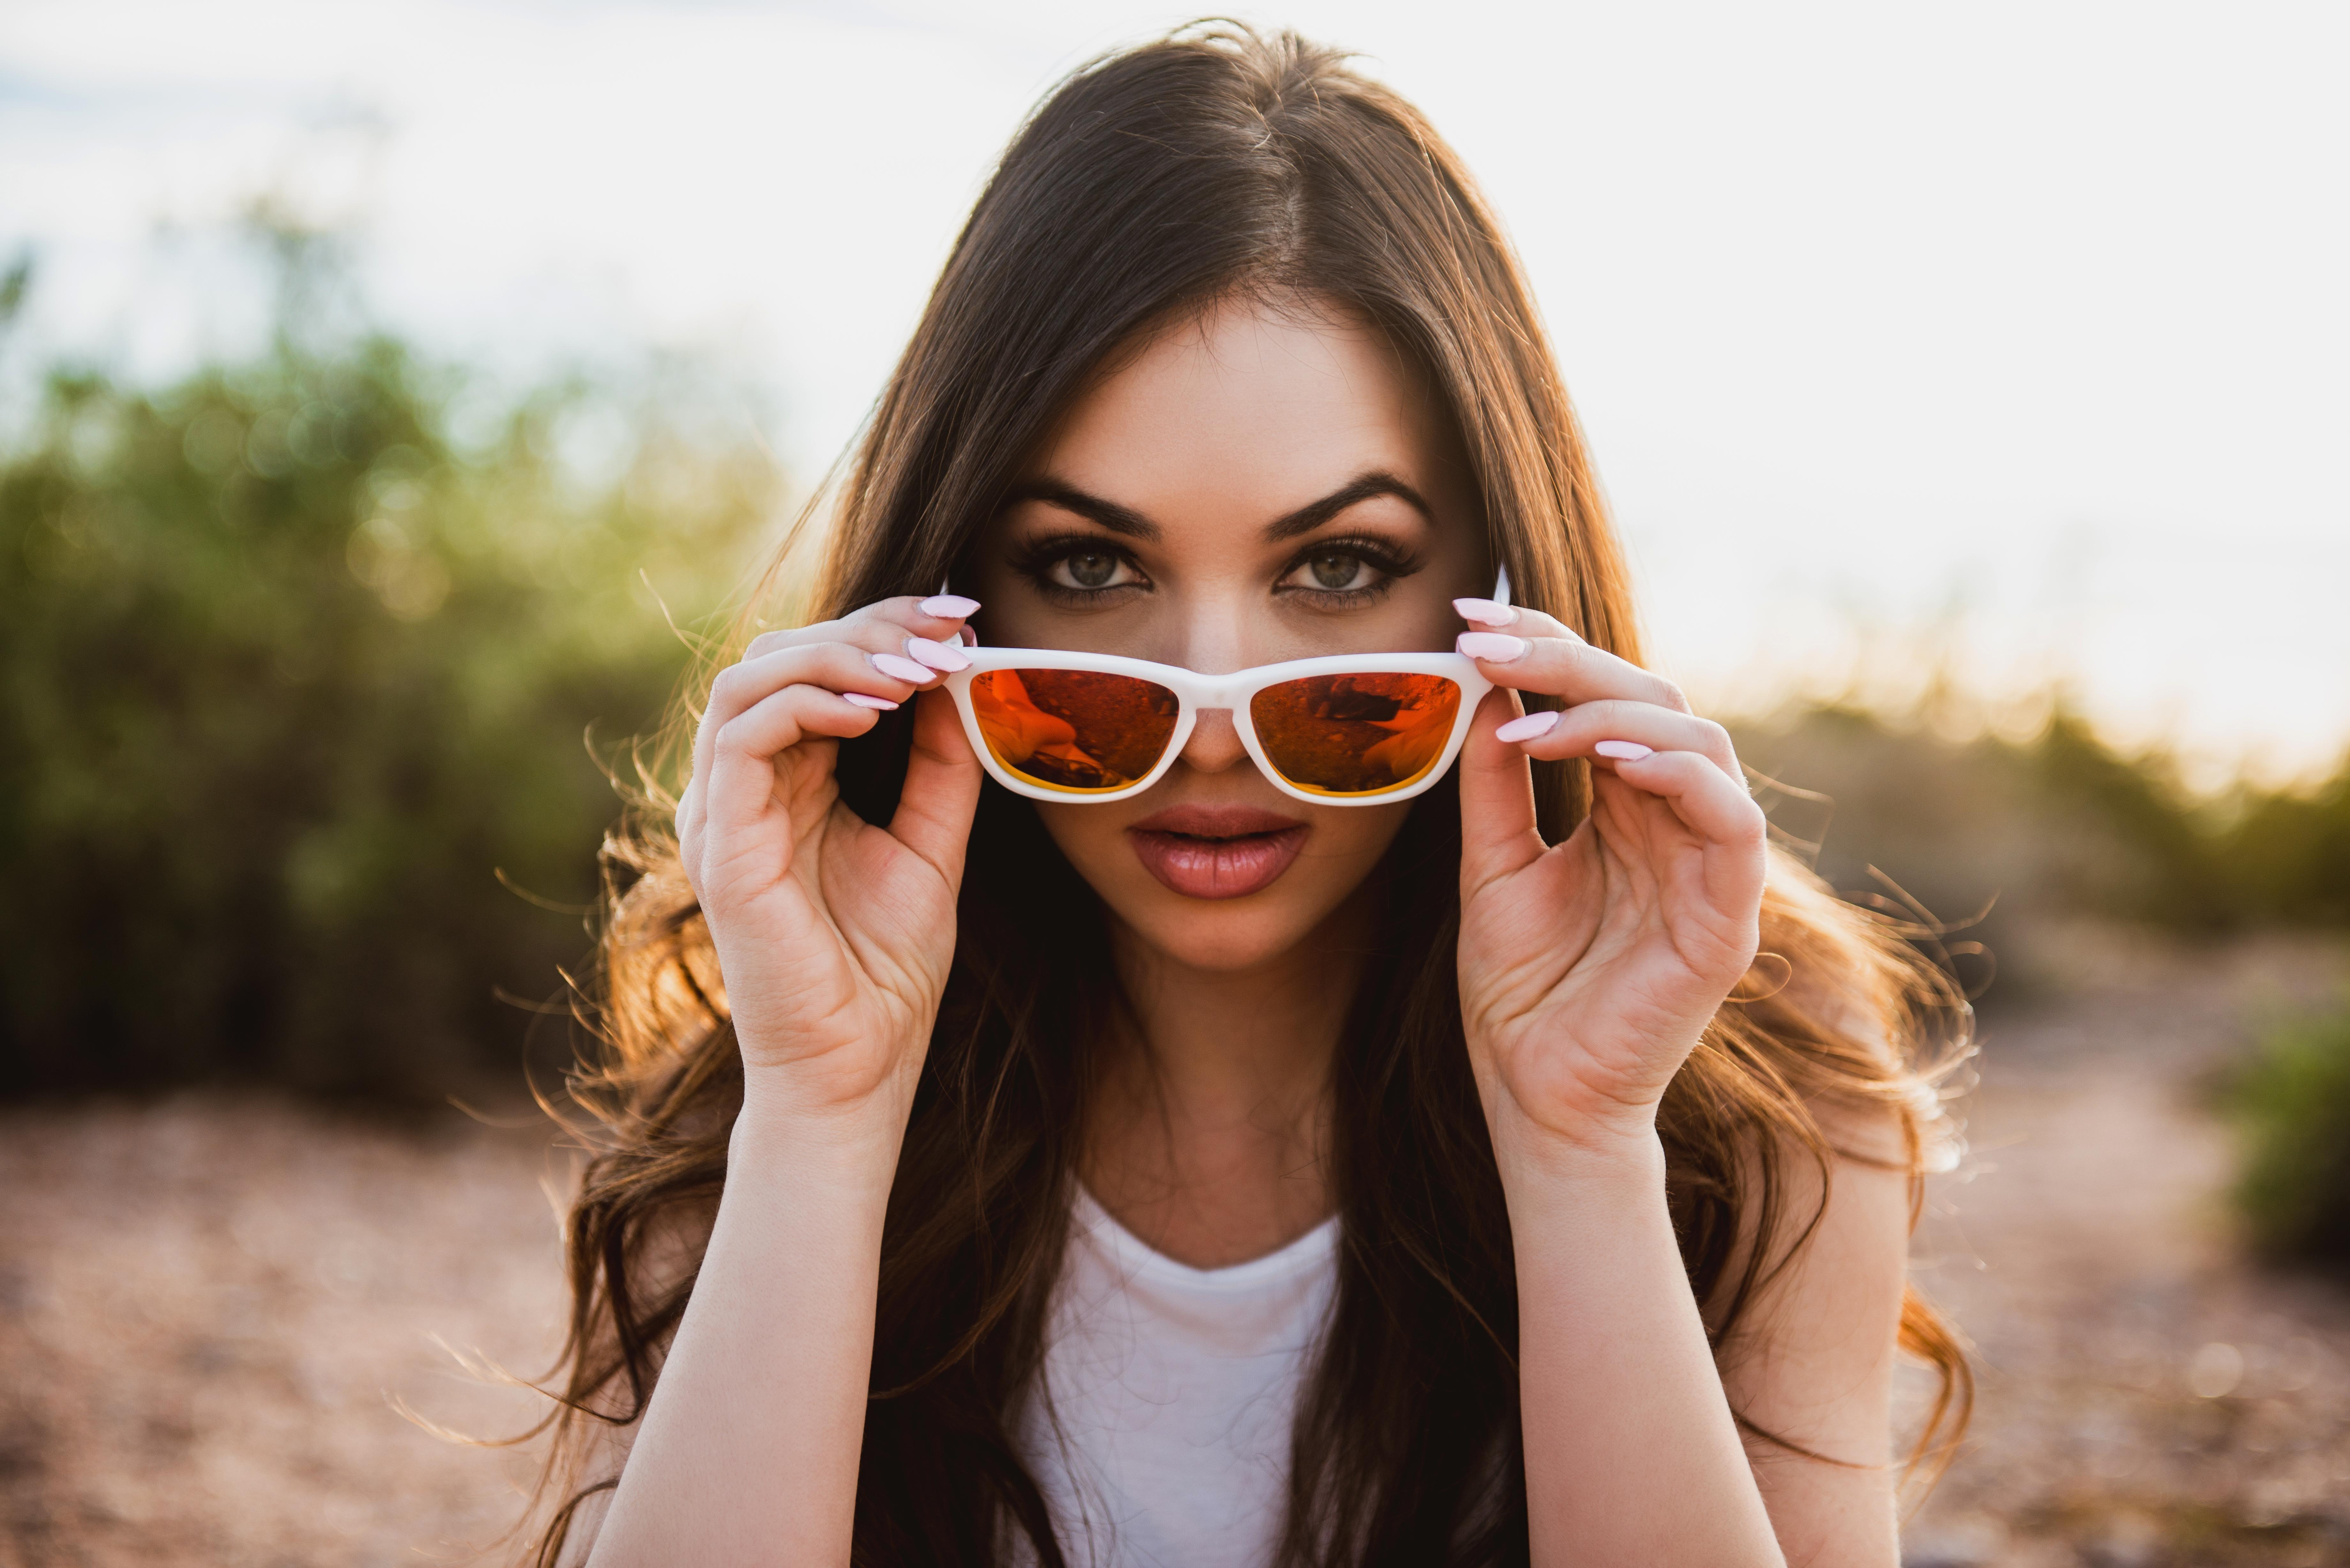 Картинки девушки в очках от солнца, россии прикол